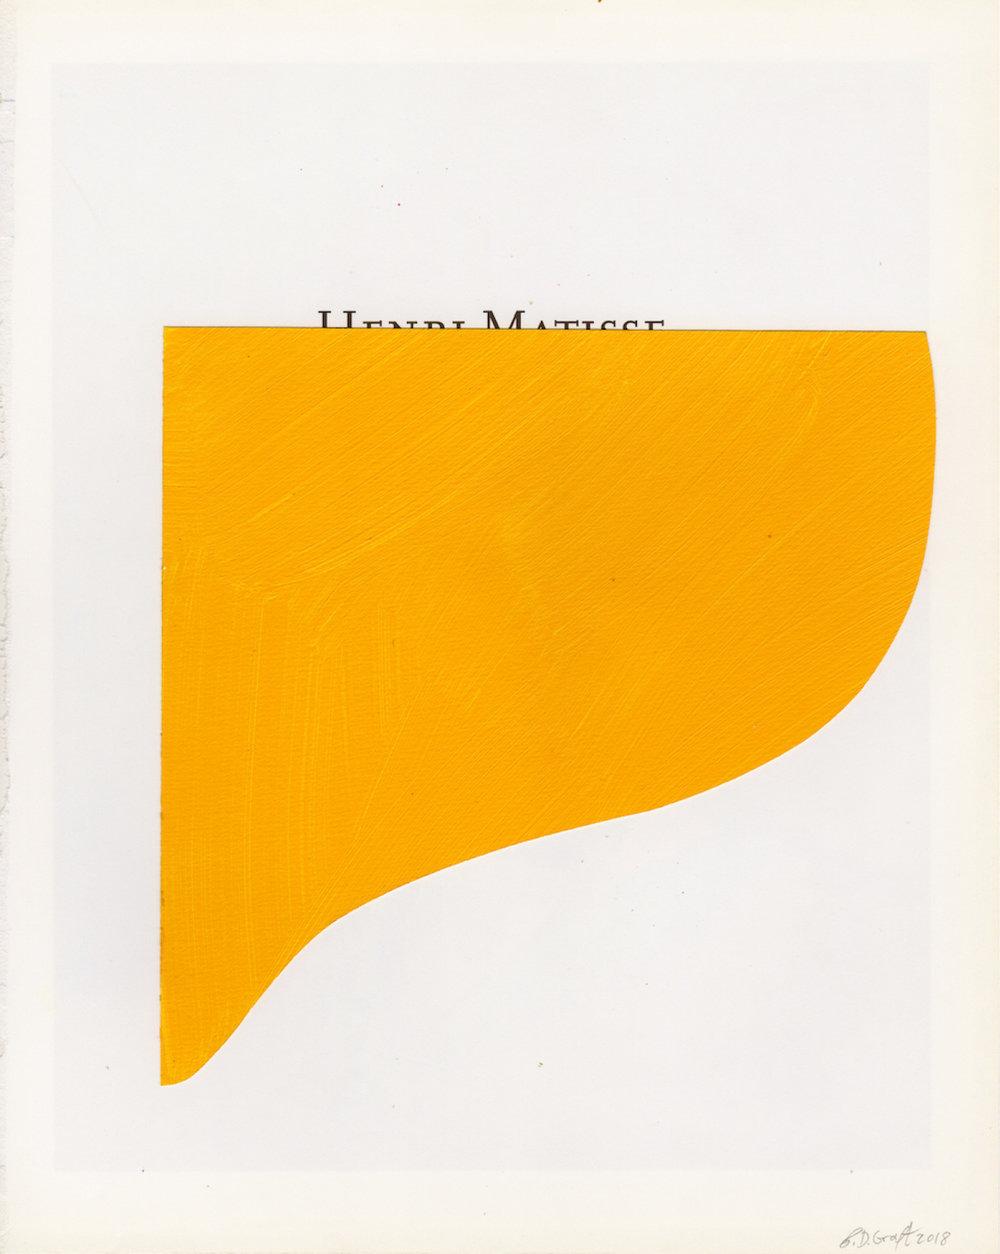 Untitled (Hommage), €300  —B.D. Graft